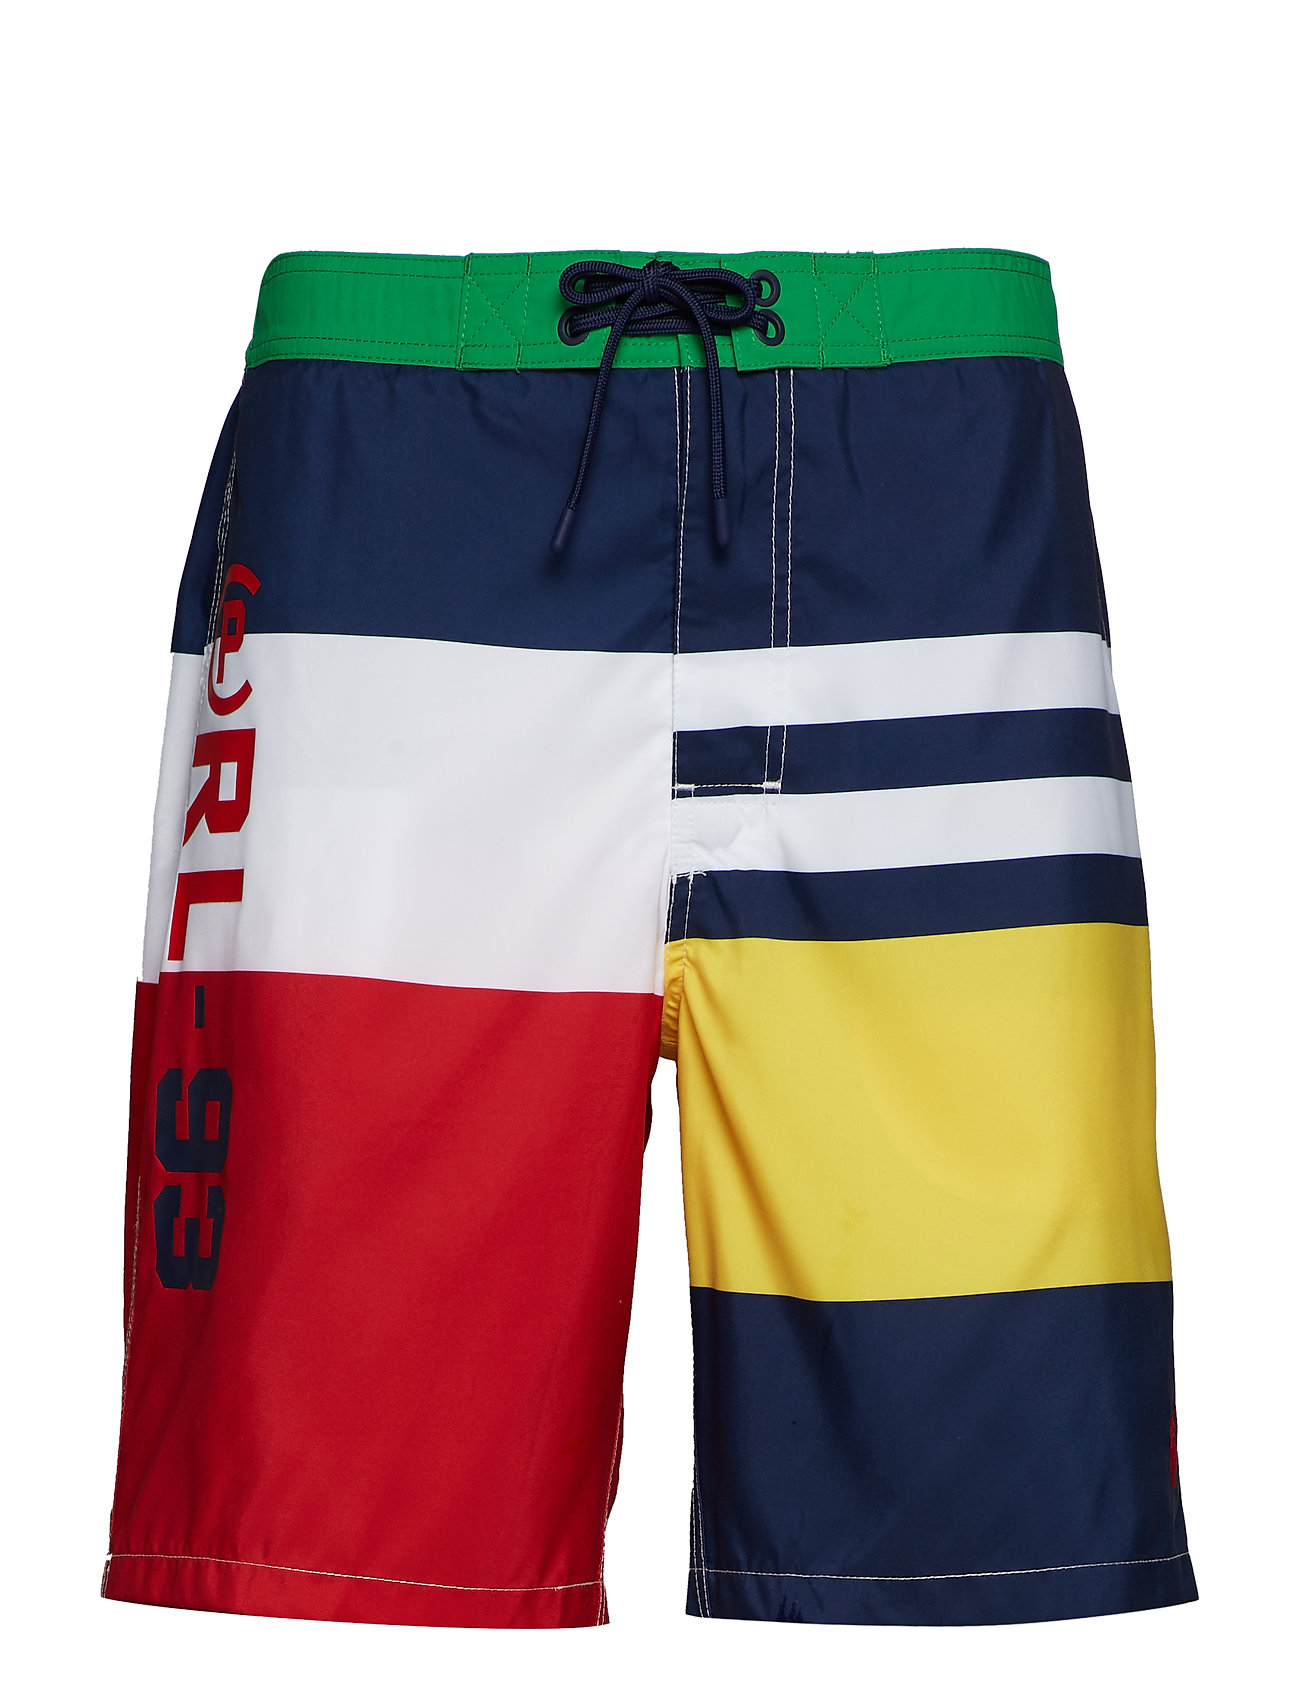 6912214ca49337 Kailua Trunk-swim (Boating Stripe) (£48.75) - Polo Ralph Lauren ...